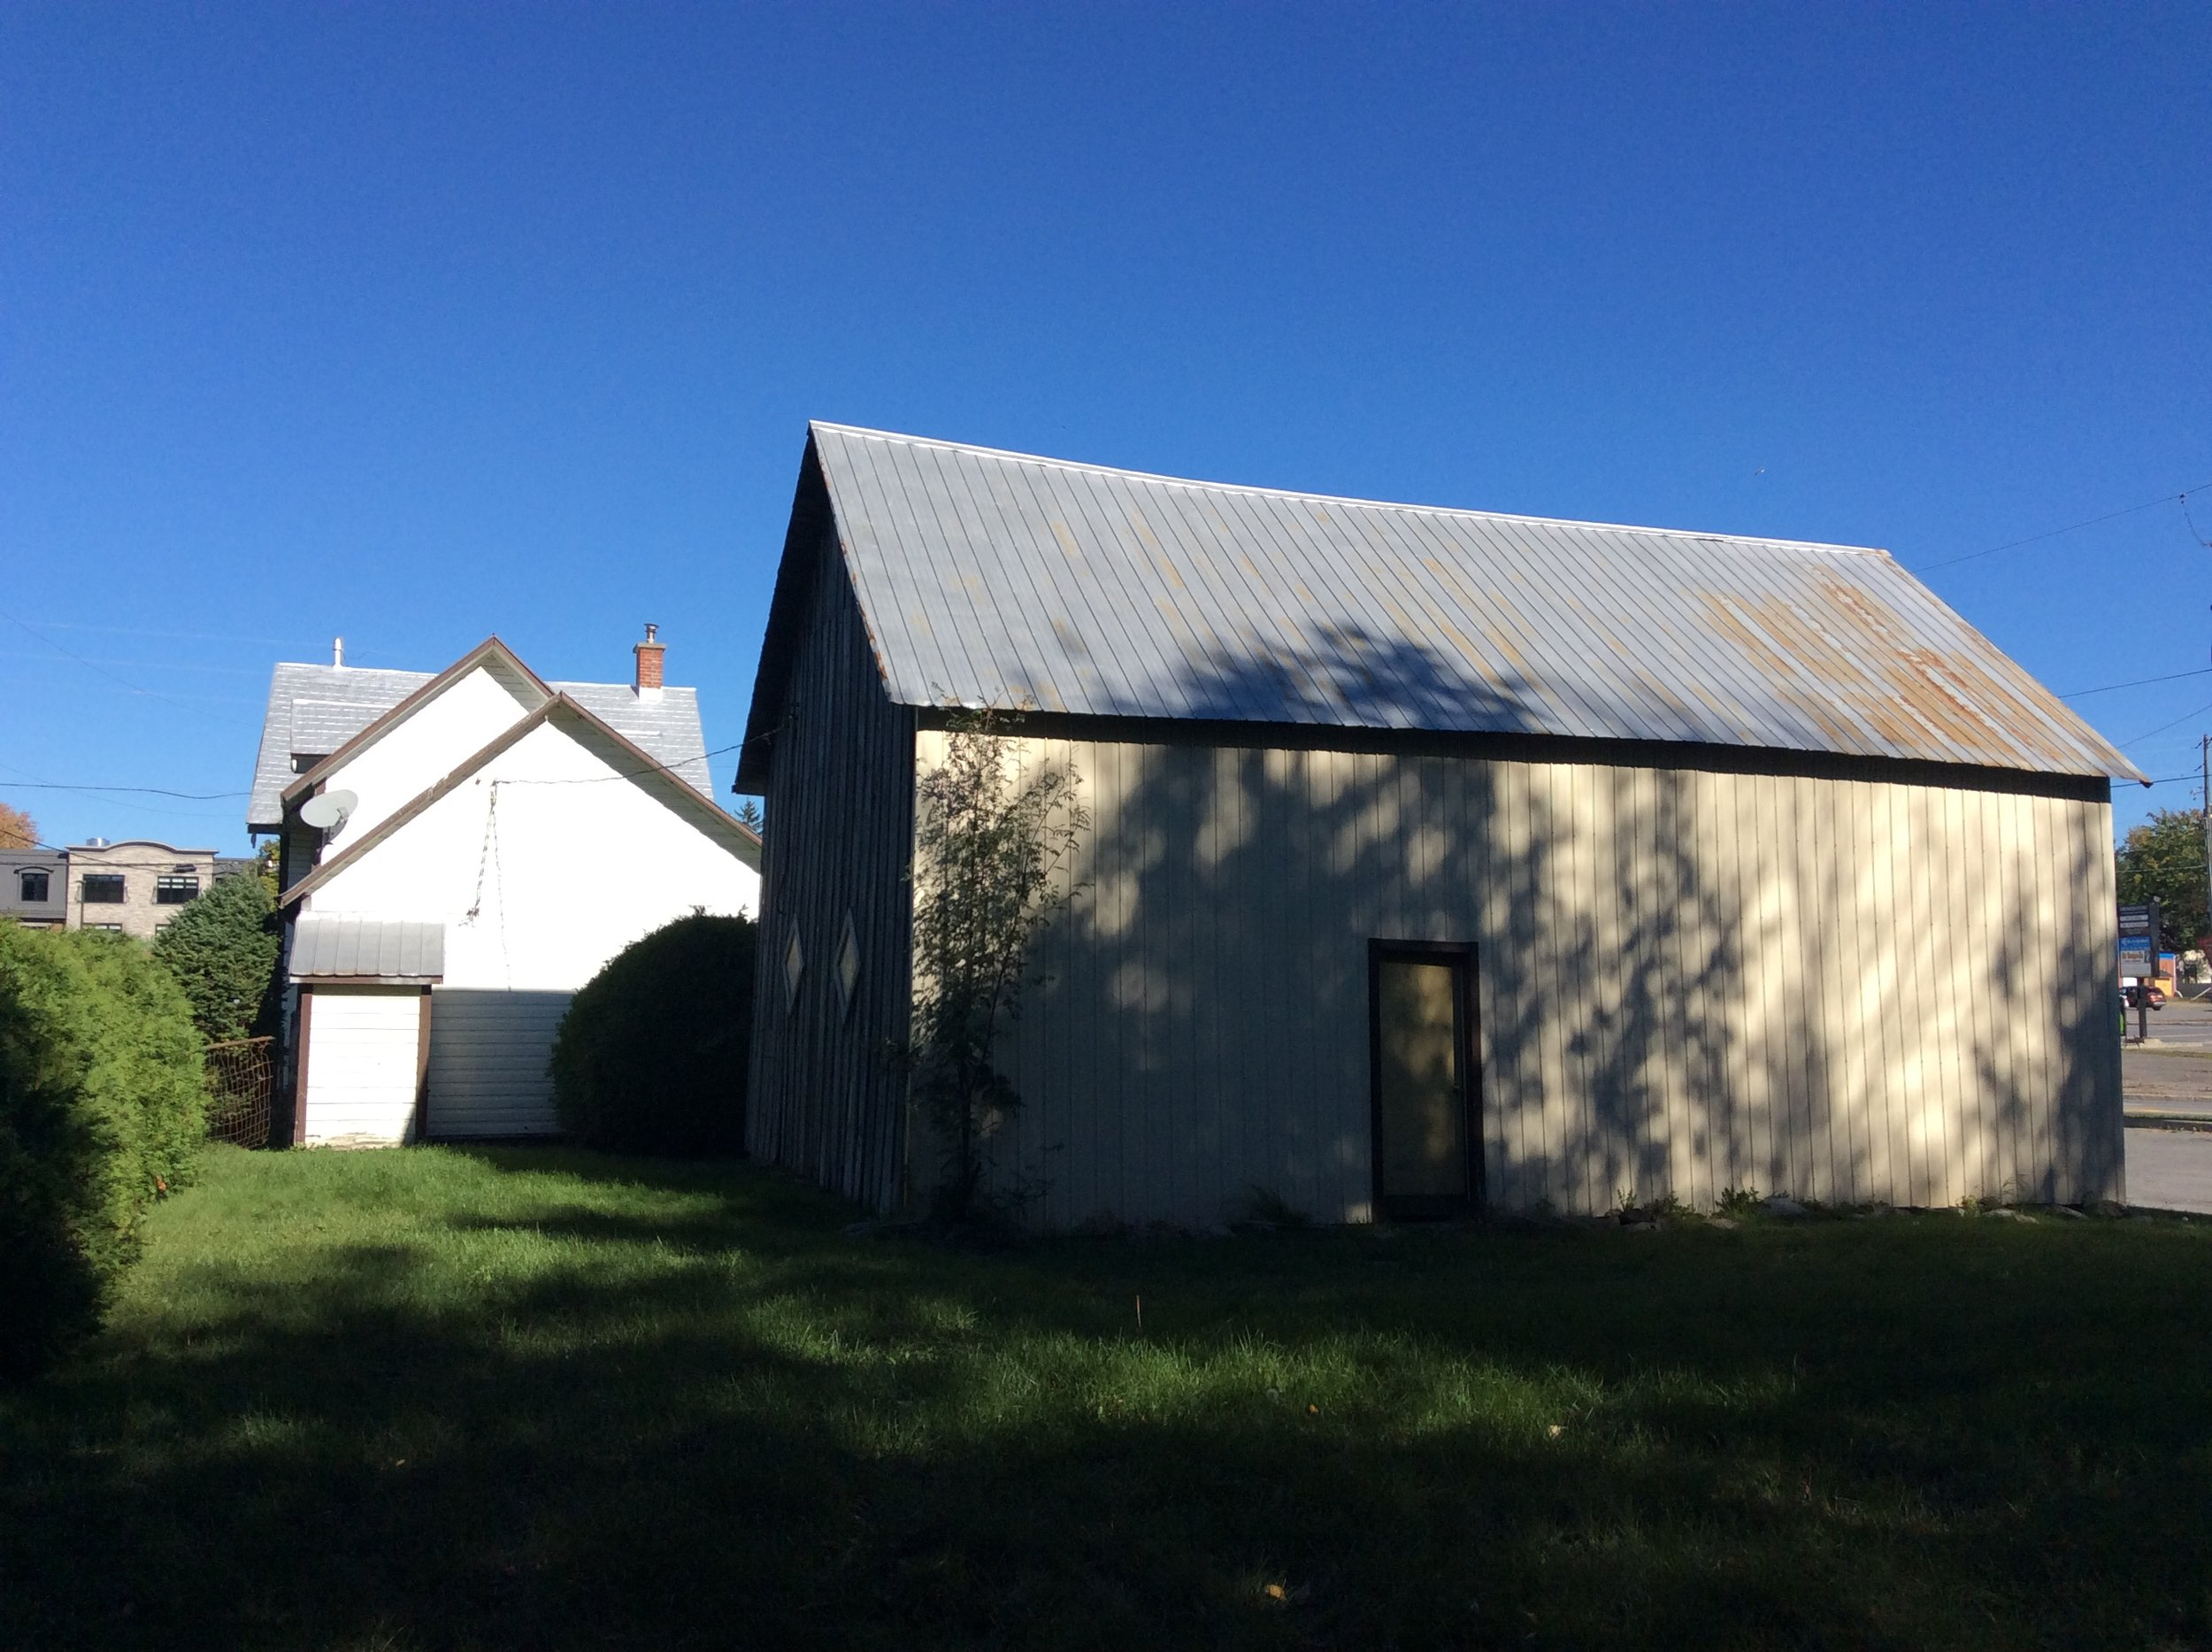 Rear Exterior and Barn